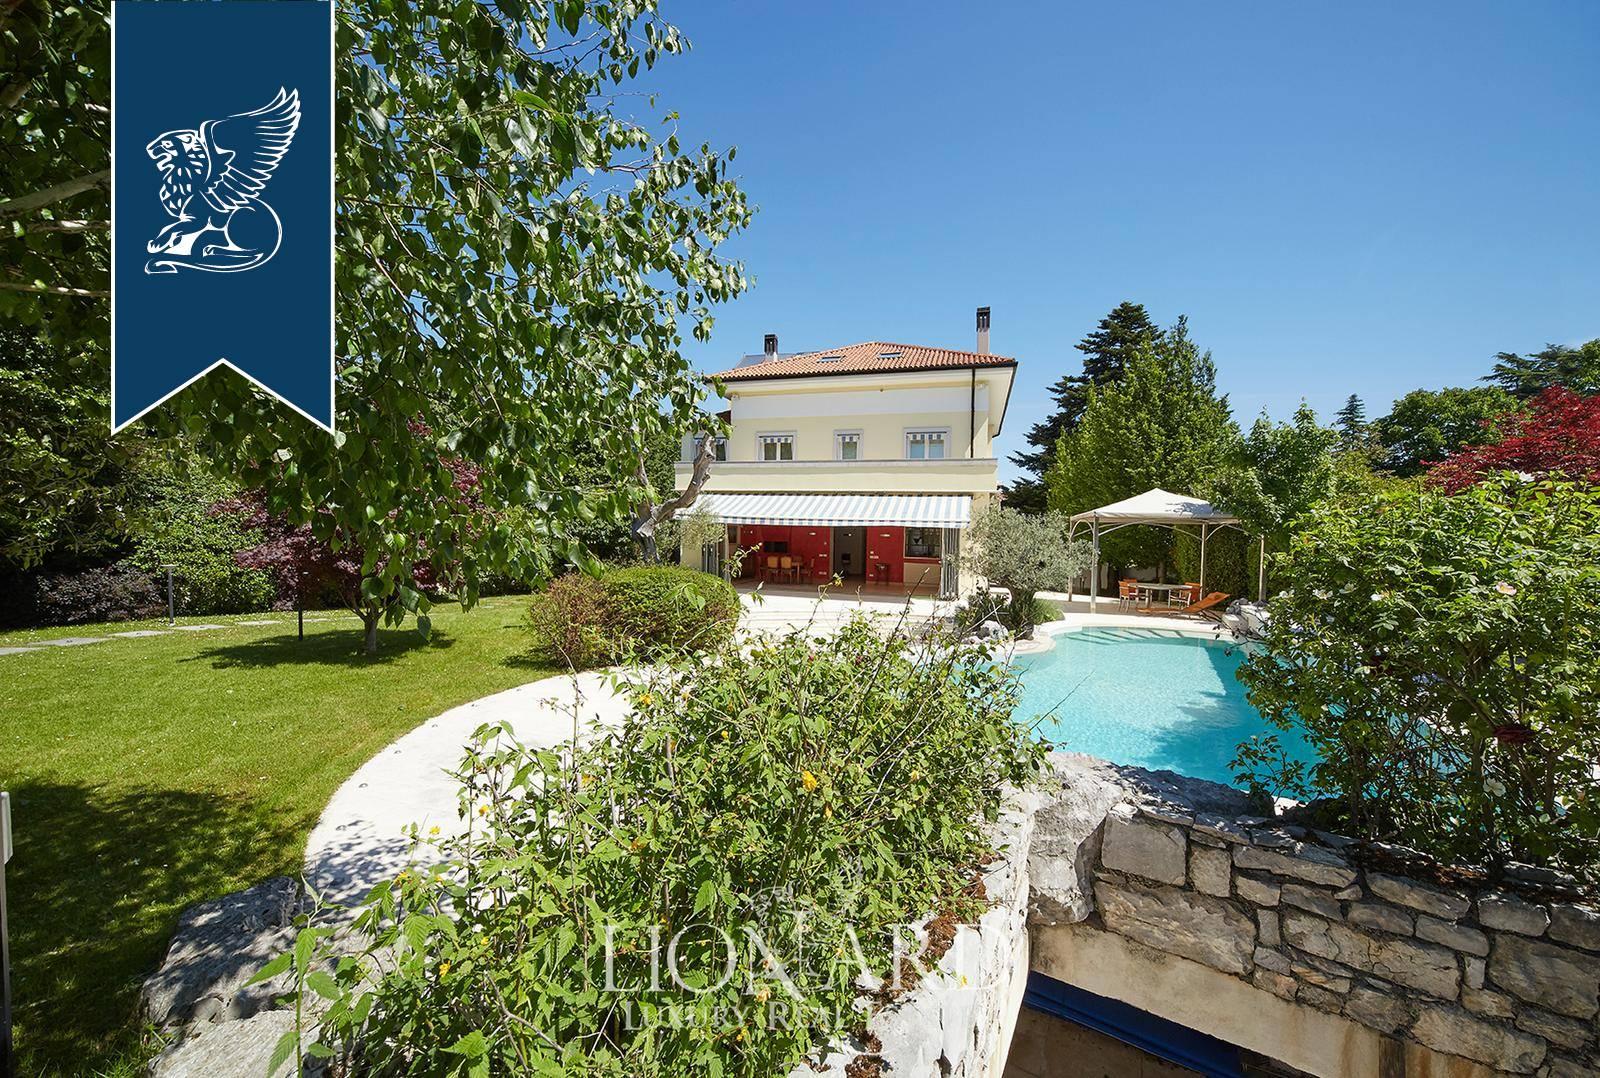 Villa in Vendita a Trieste: 0 locali, 500 mq - Foto 4